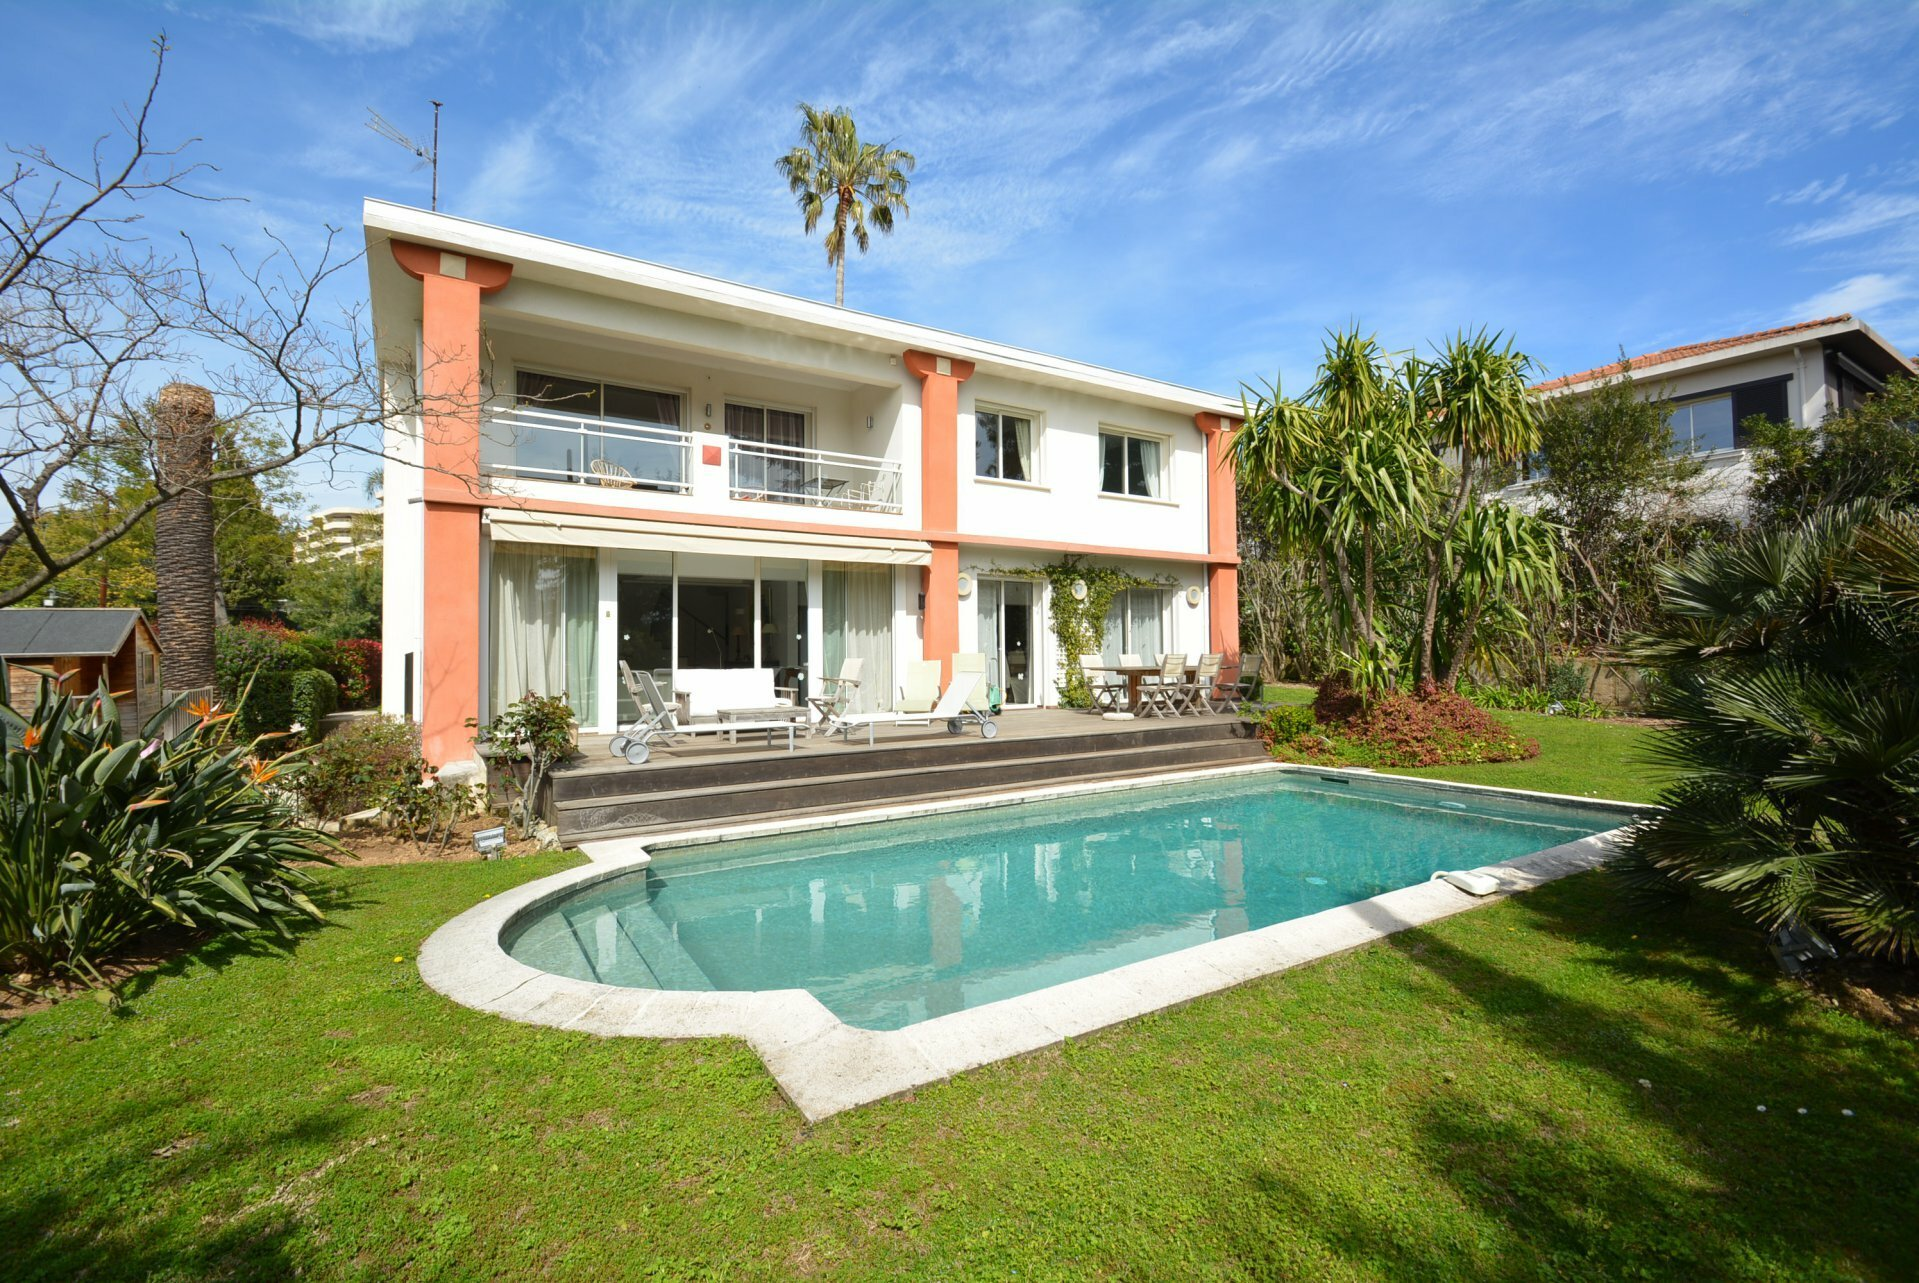 House in Cannes, Provence-Alpes-Côte d'Azur, France 1 - 11153178